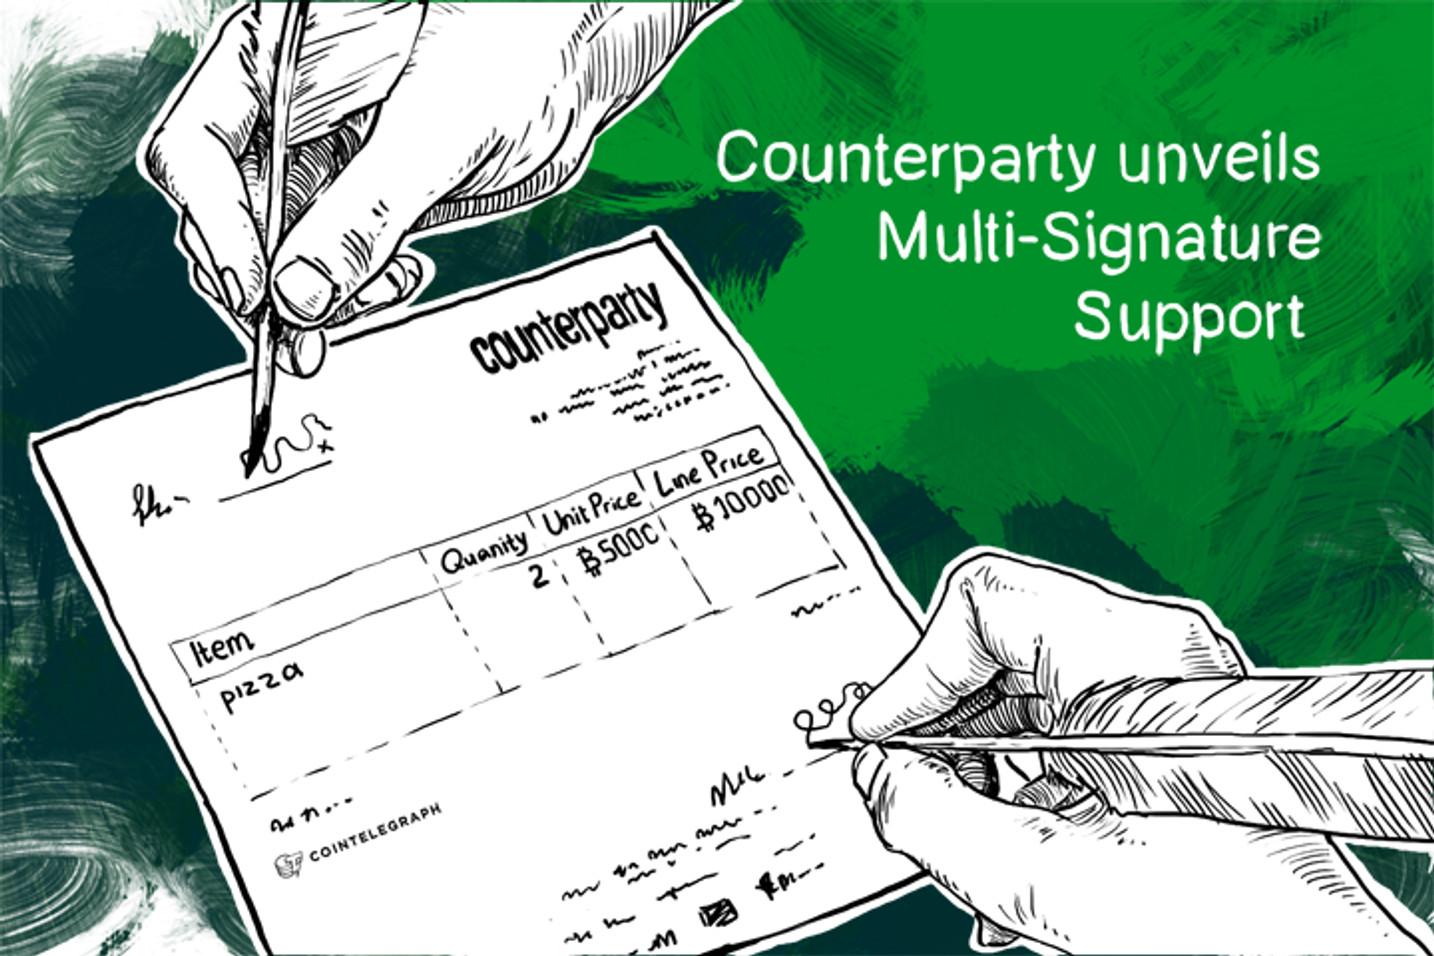 Counterparty unveils Multi-Signature Support